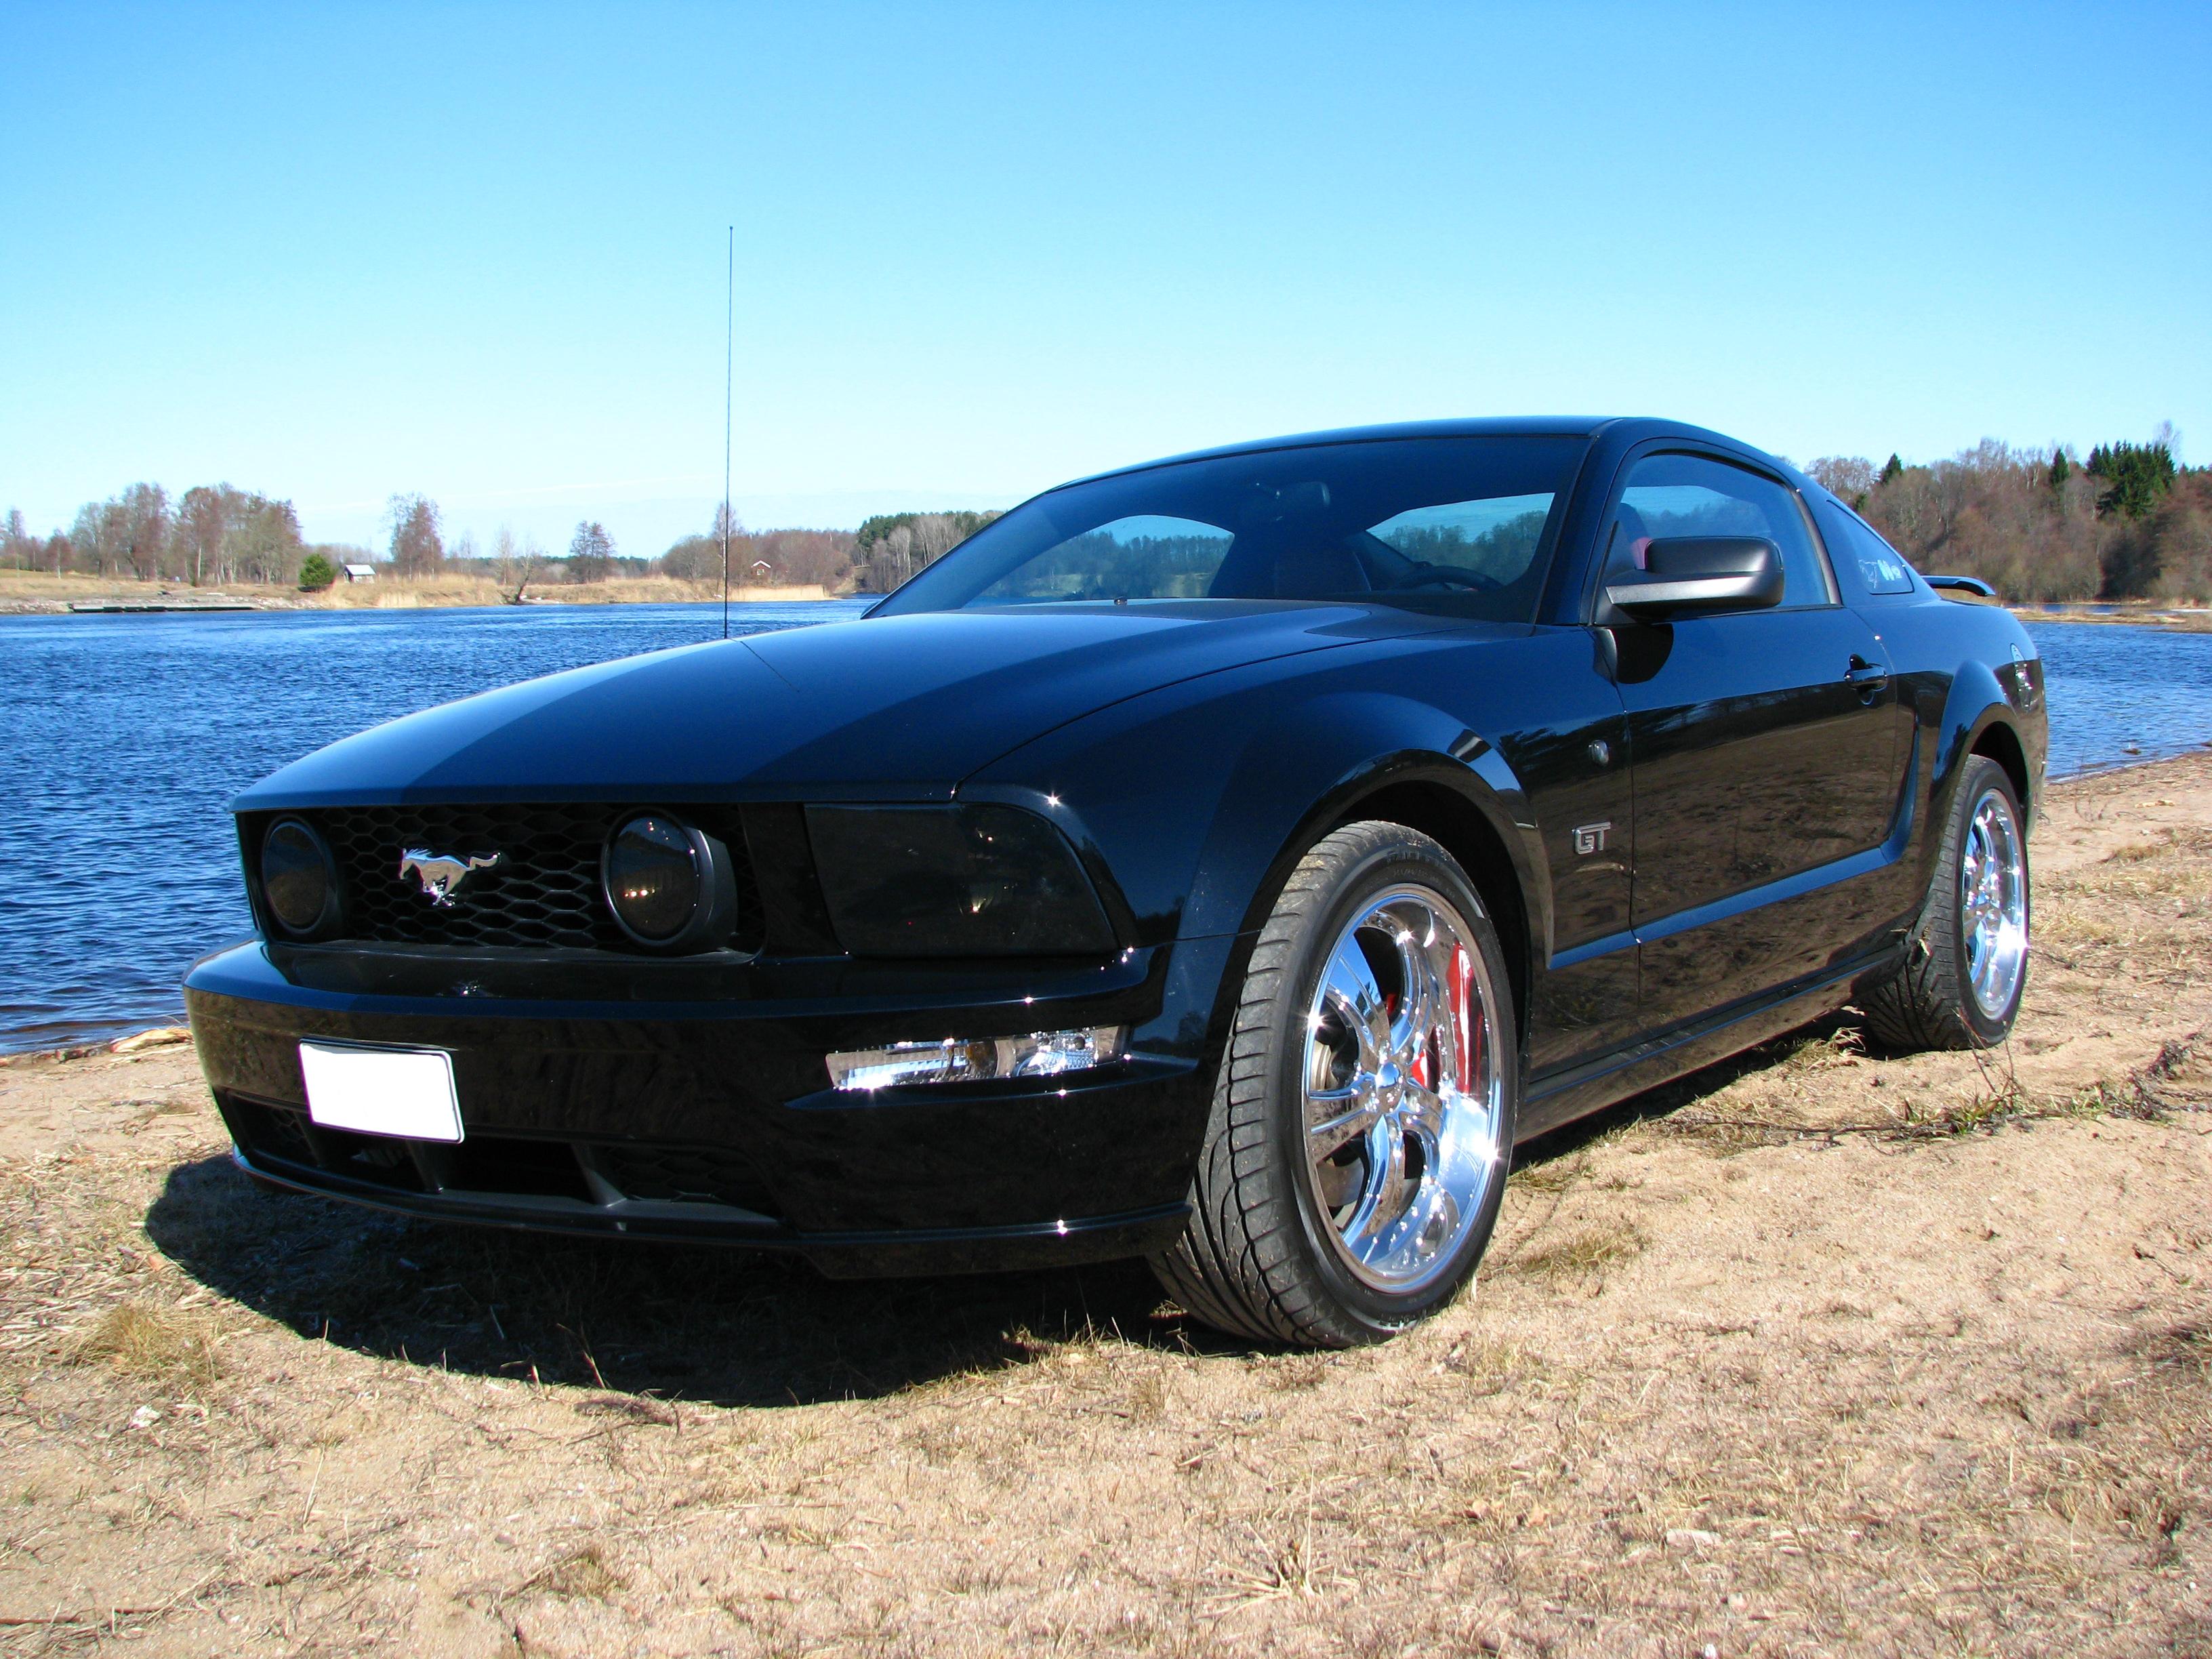 fileford mustang gt 2005 blackpng - Ford Mustang Gt Black